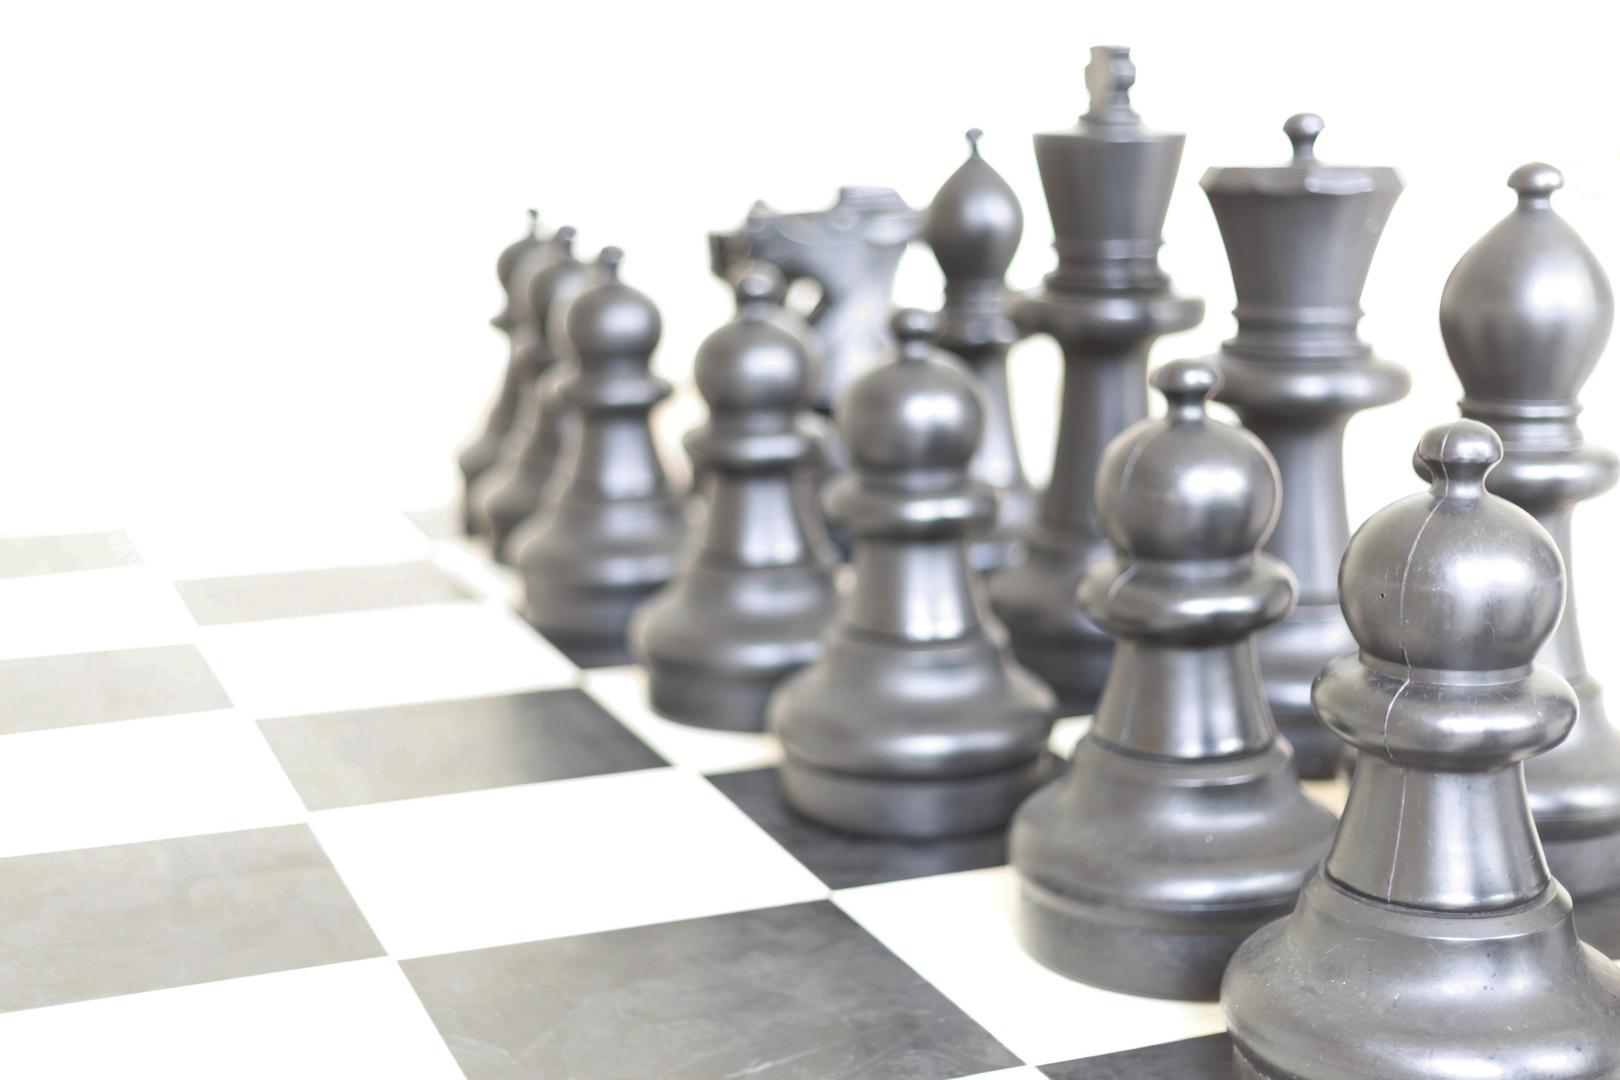 Schach - aber nicht matt